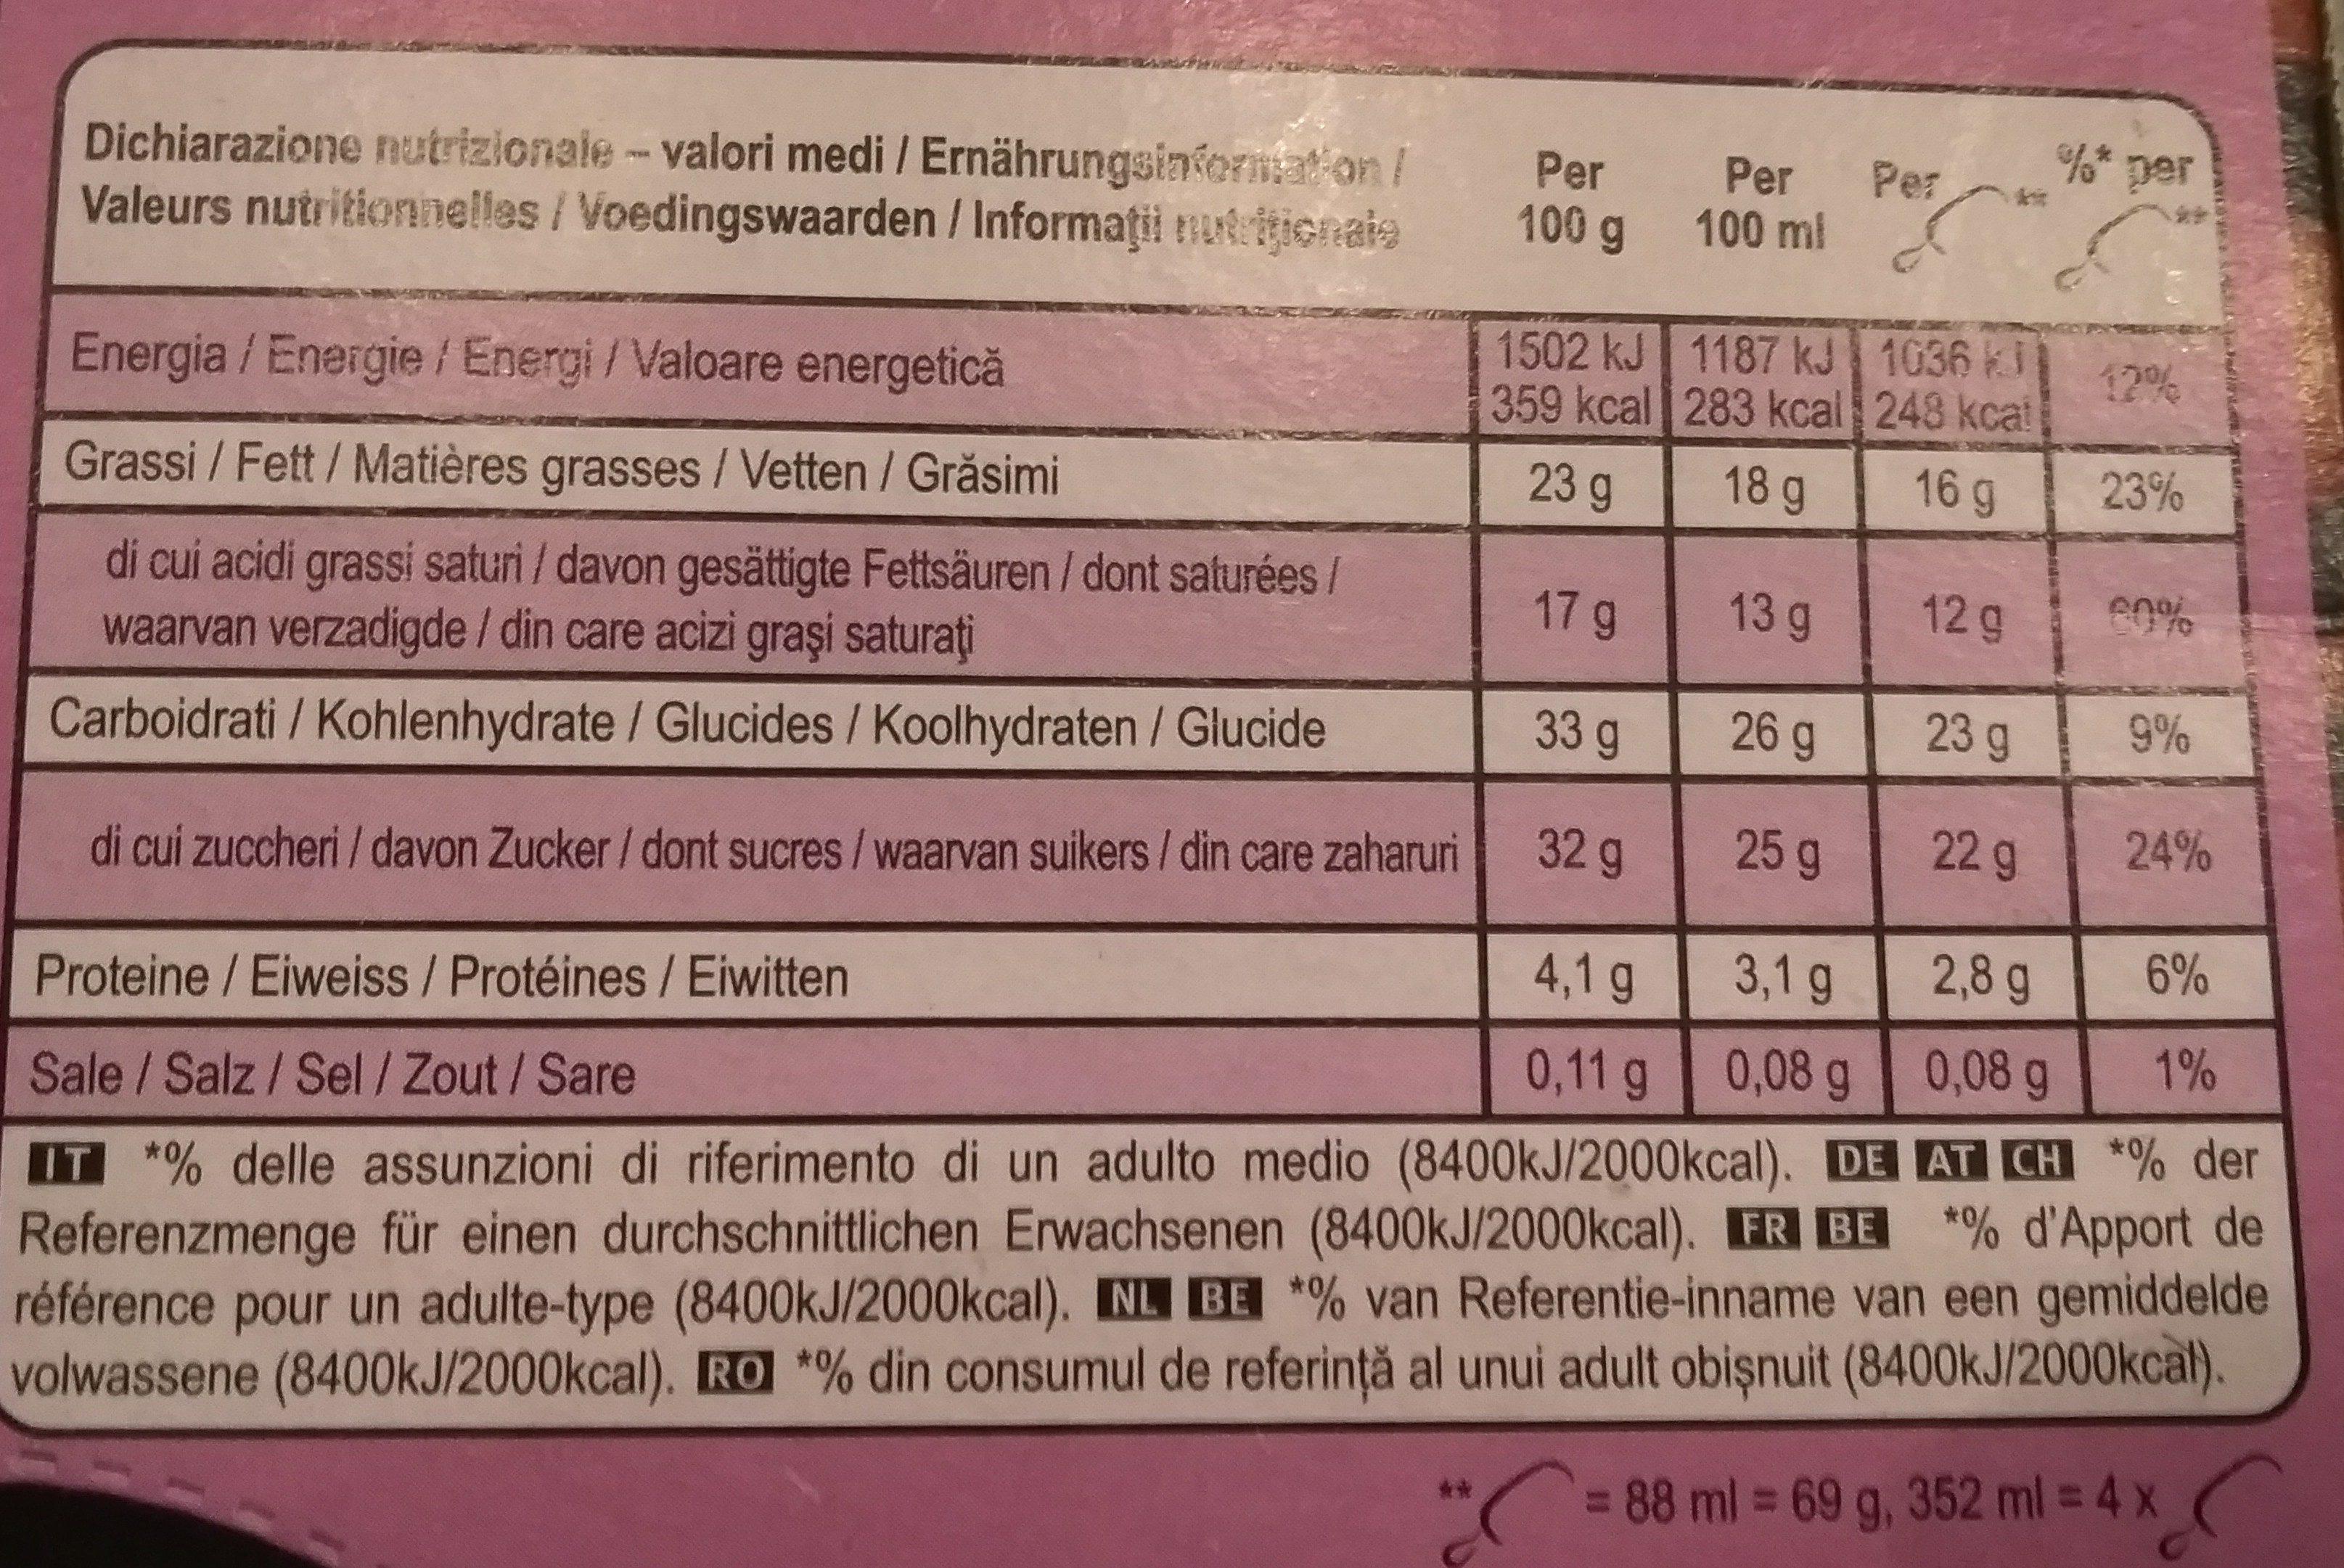 Magnum Batonnet Glace Double Chocolat x 4 352 ml - Voedingswaarden - nl